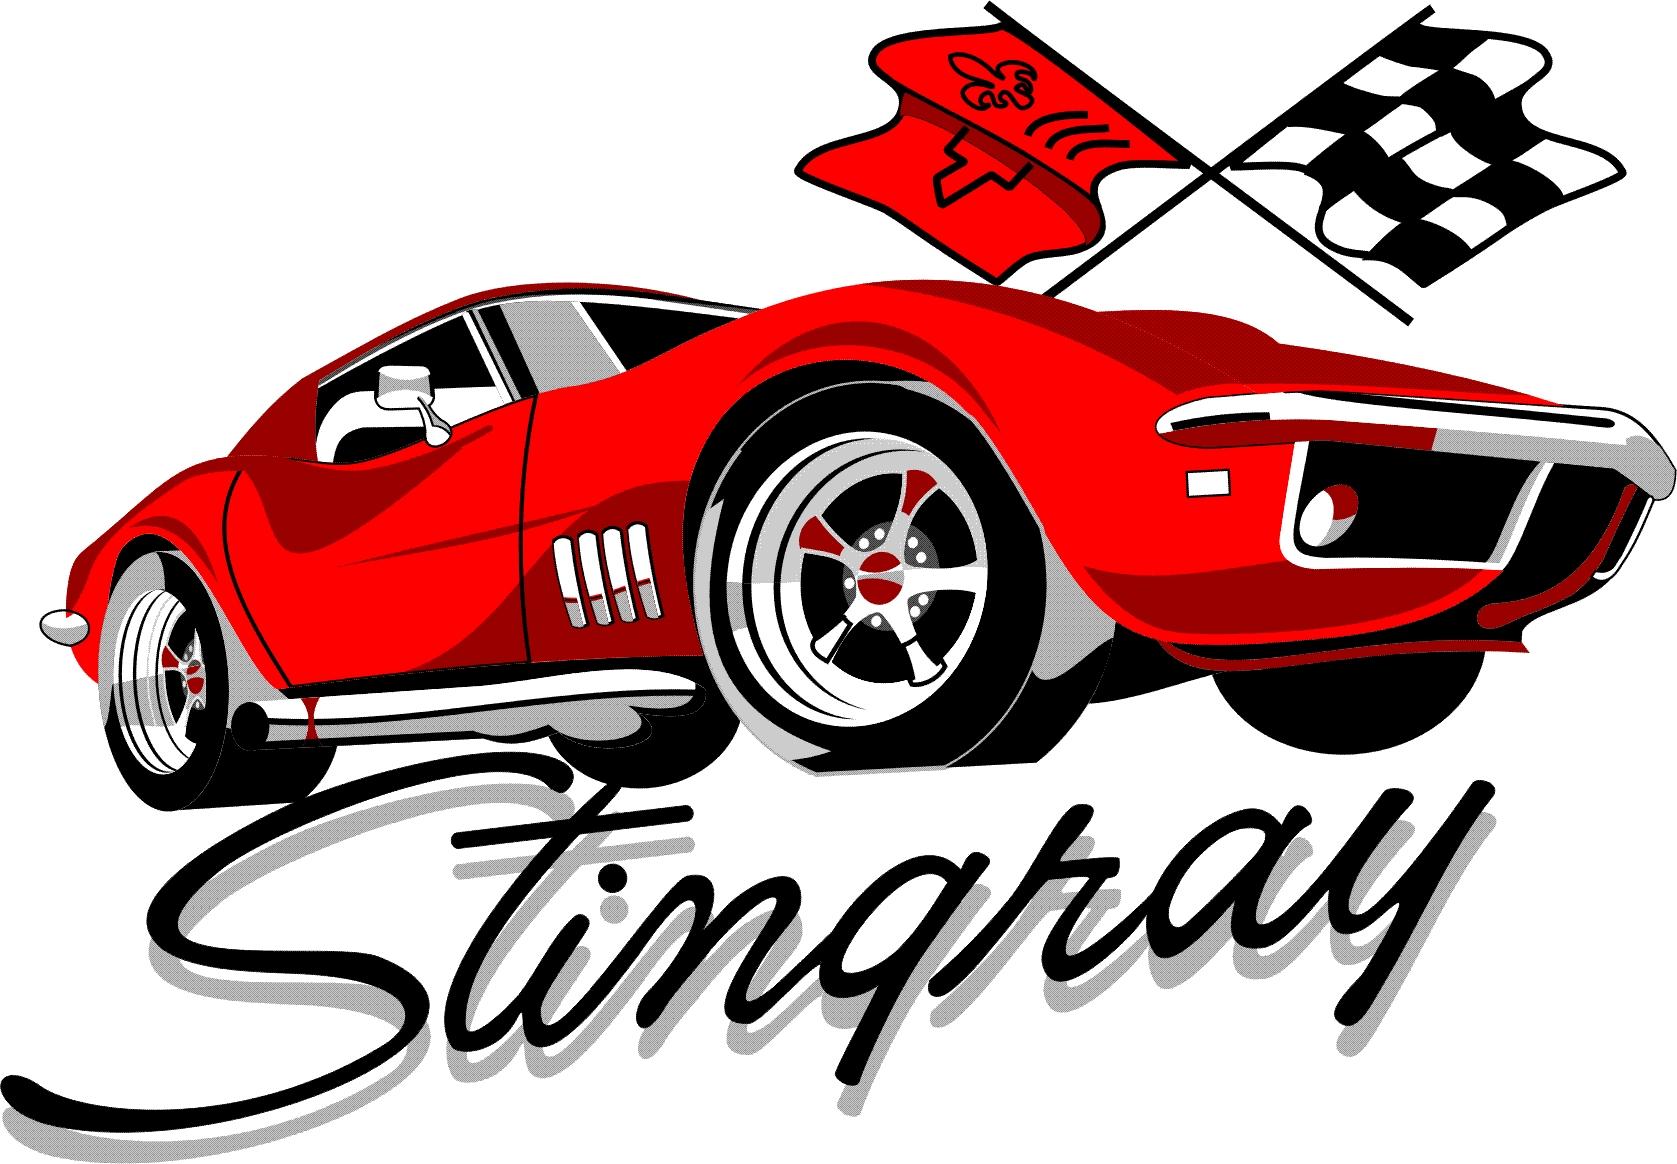 Old Race Car Drawings